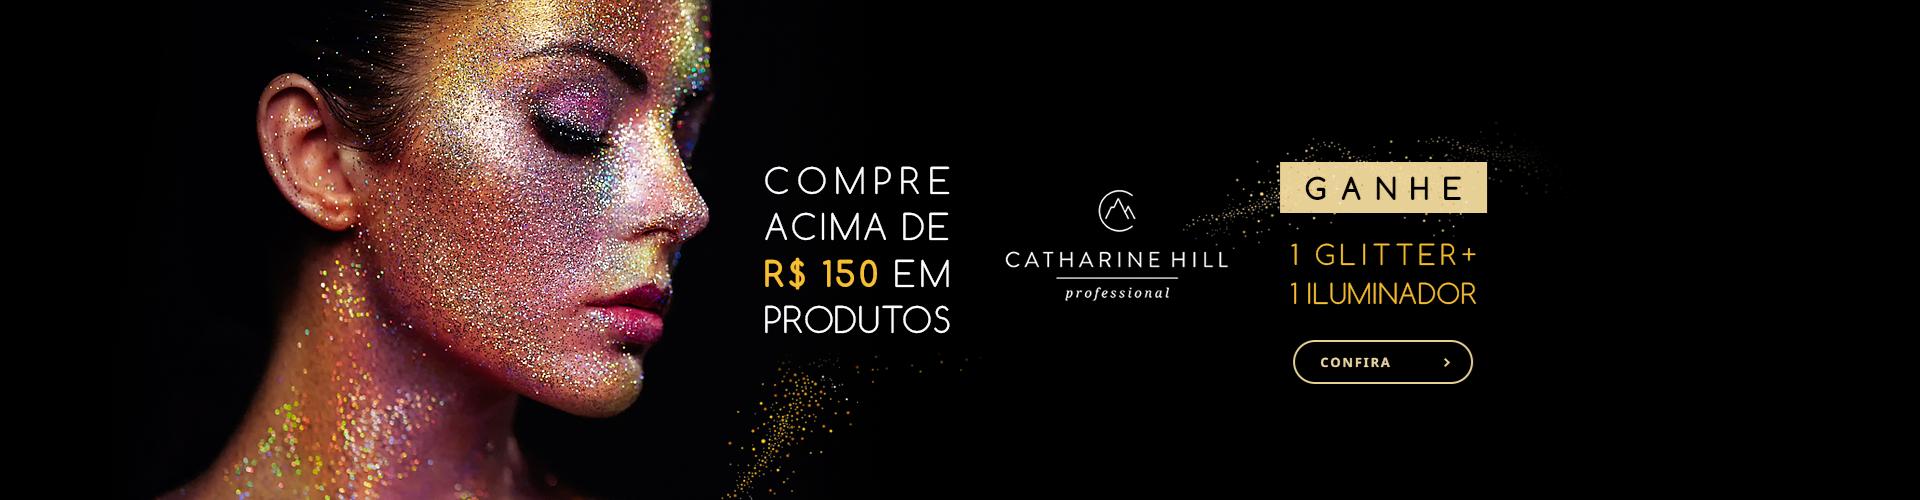 Catharine Hill - Carnaval